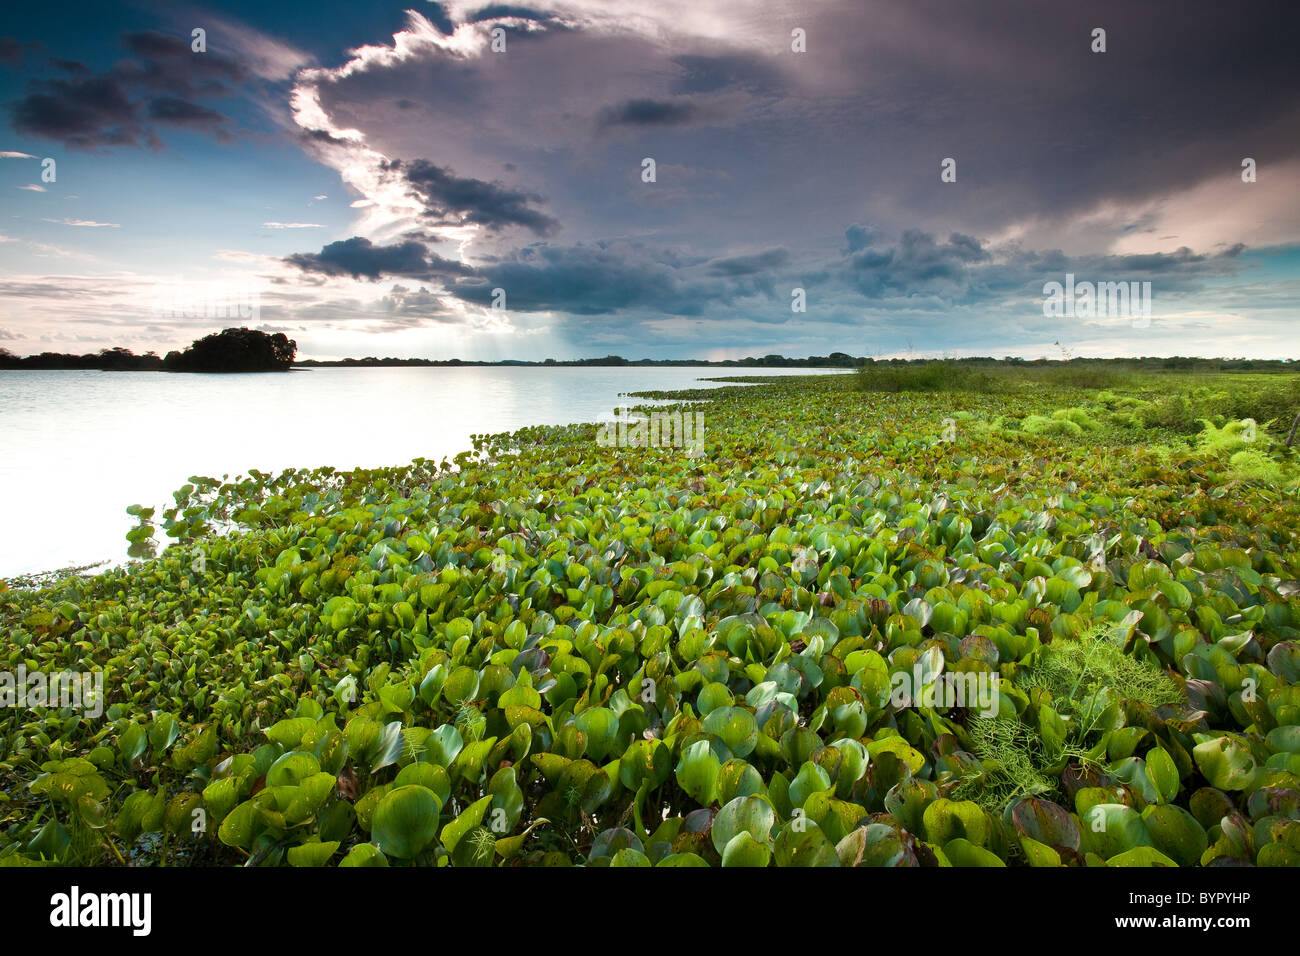 Junto ao lago de Refugio de vida silvestre Cienaga de las Macanas natureza reserva, na província de Herrera, Imagens de Stock